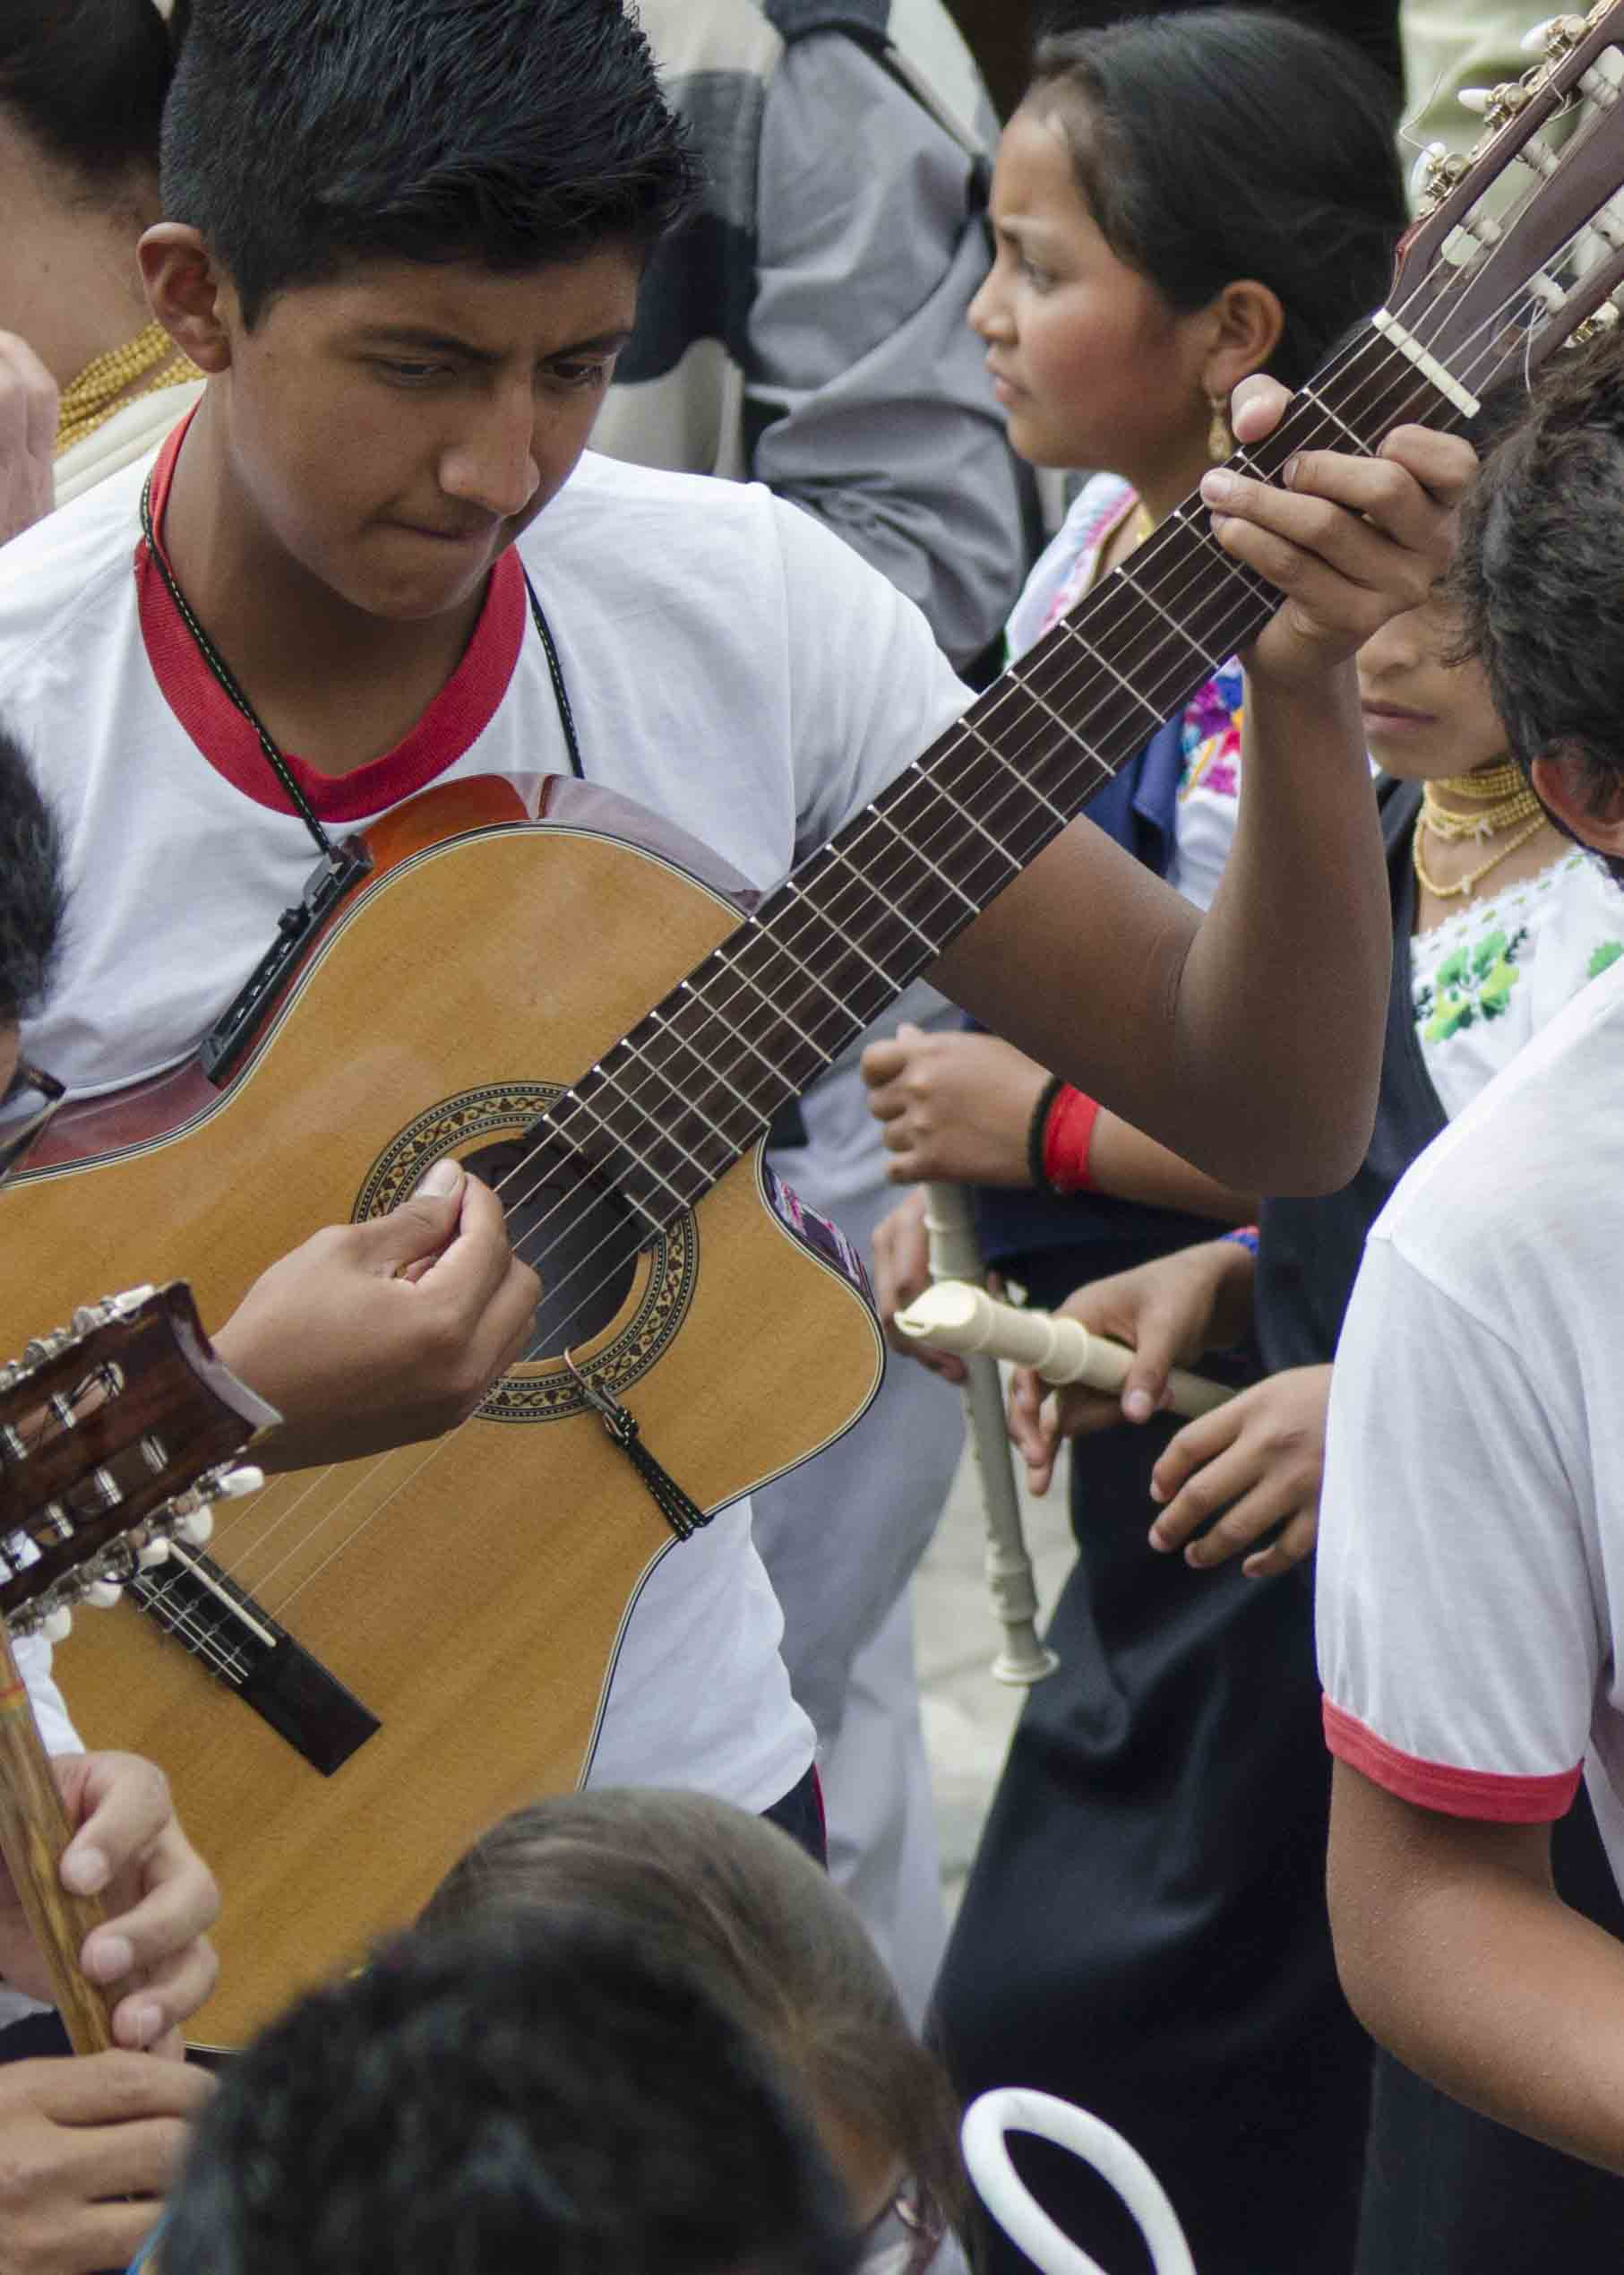 Guitar Player, Inti Raymi, Parade of Schools, Cotachi, Ecuador